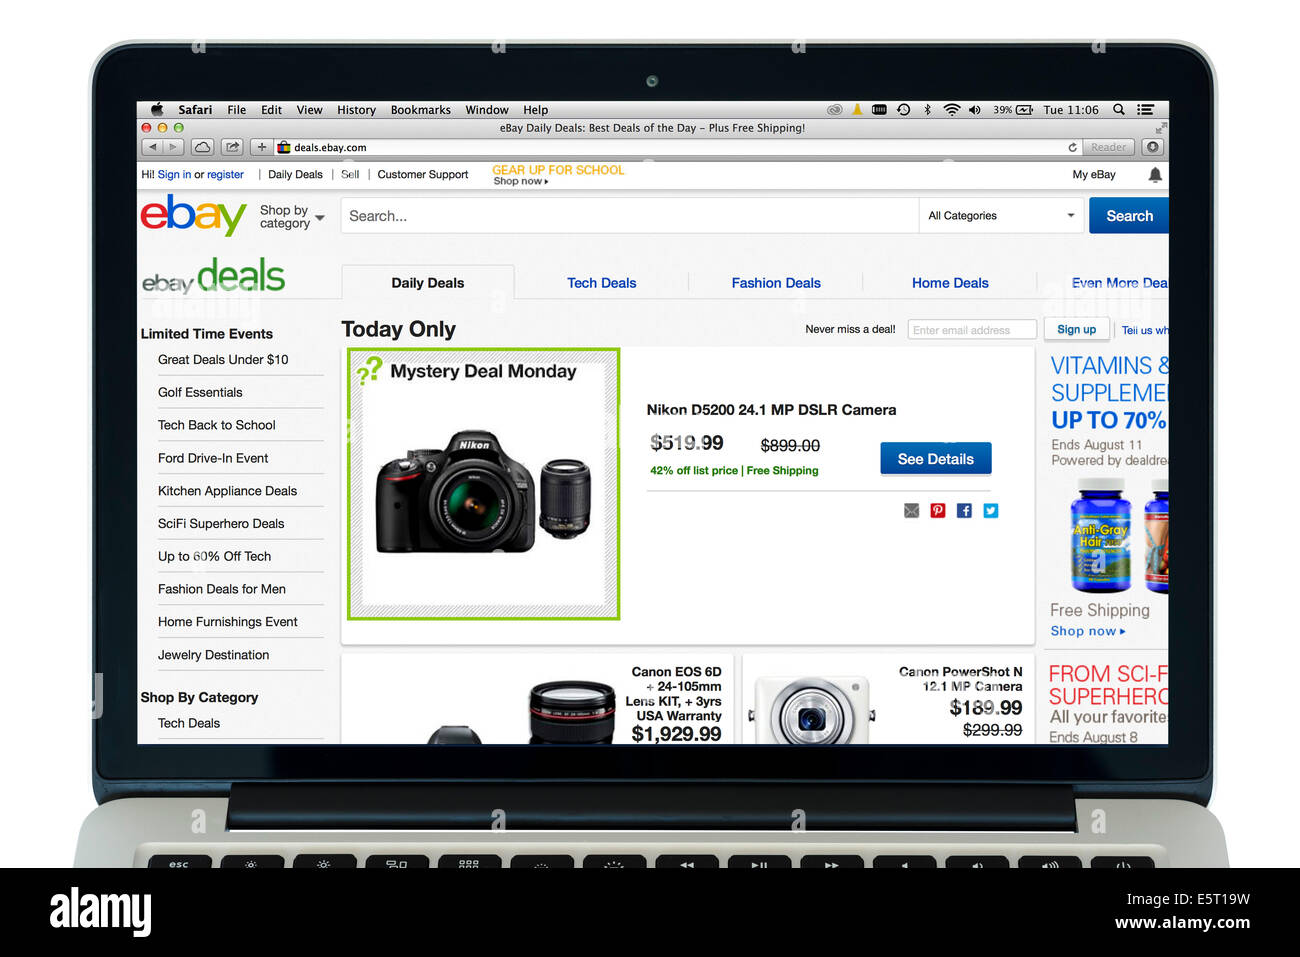 Ebay.com on a 13' Apple MacBook Pro Retina computer - Stock Image